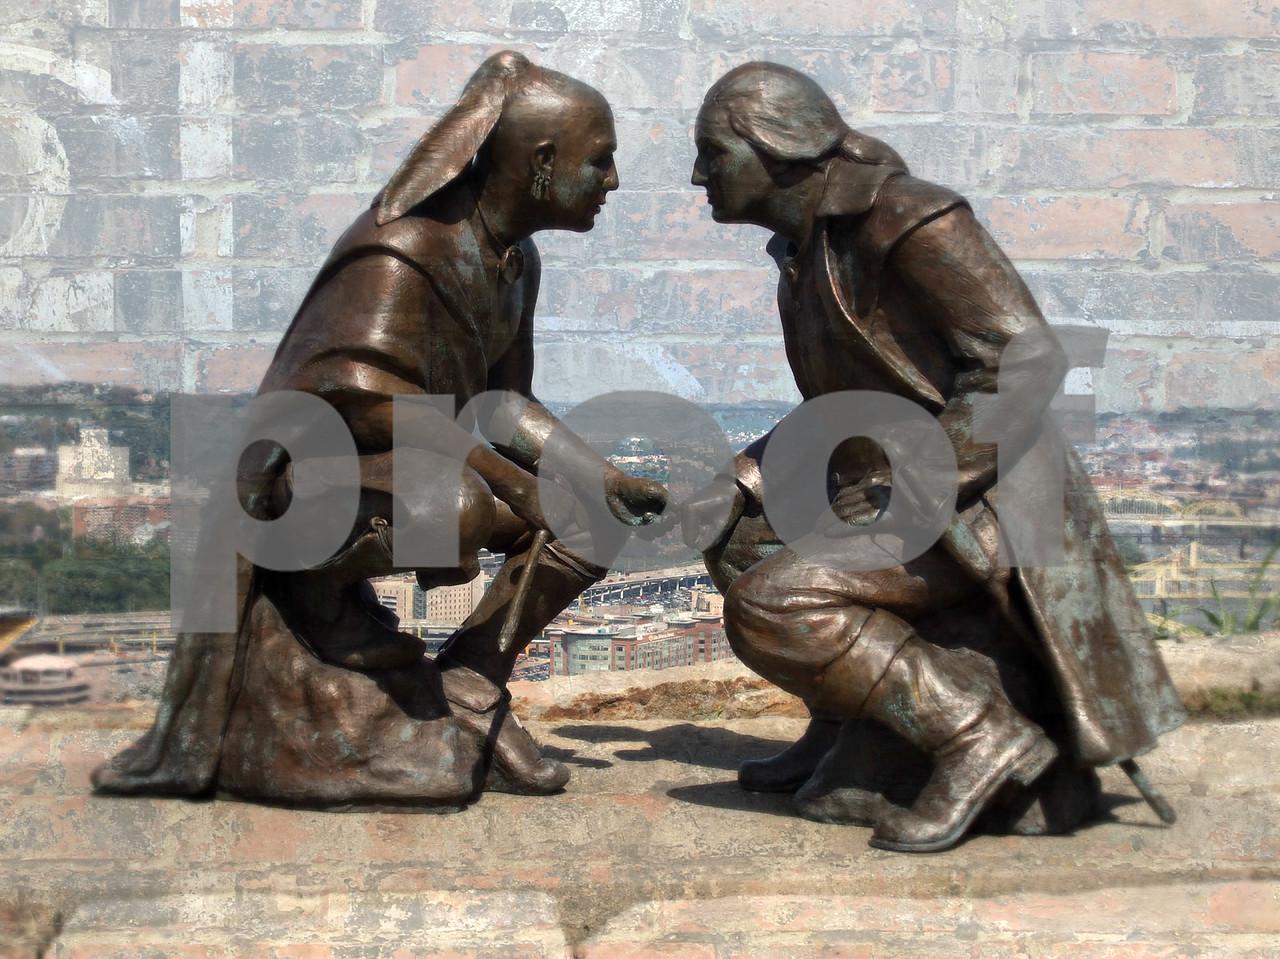 Sculpture by James A. West depicts October 1770 meeting between Seneca Leader & George Washington